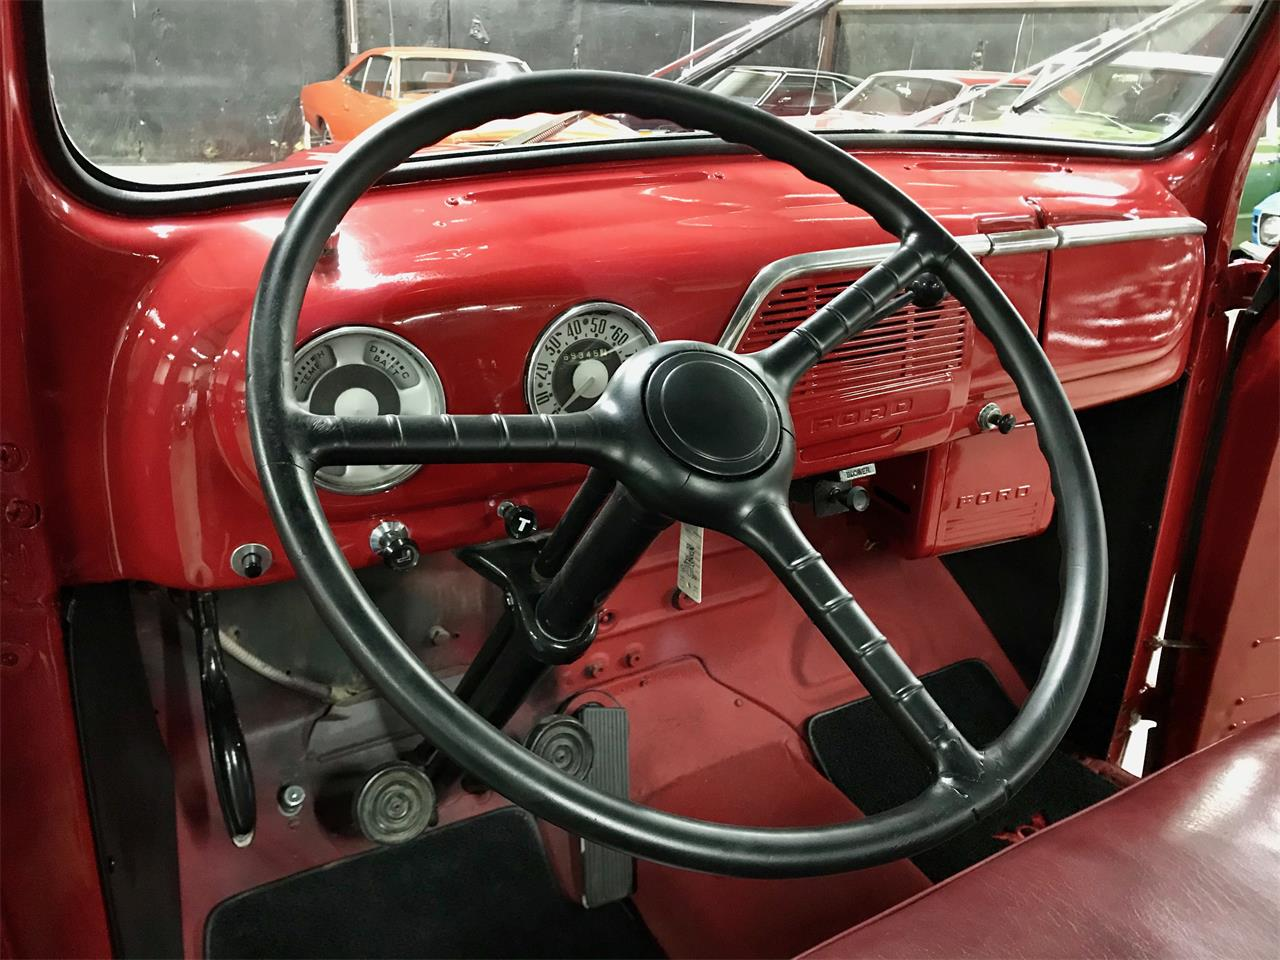 Ford F1 V8 1852 prix tout compris